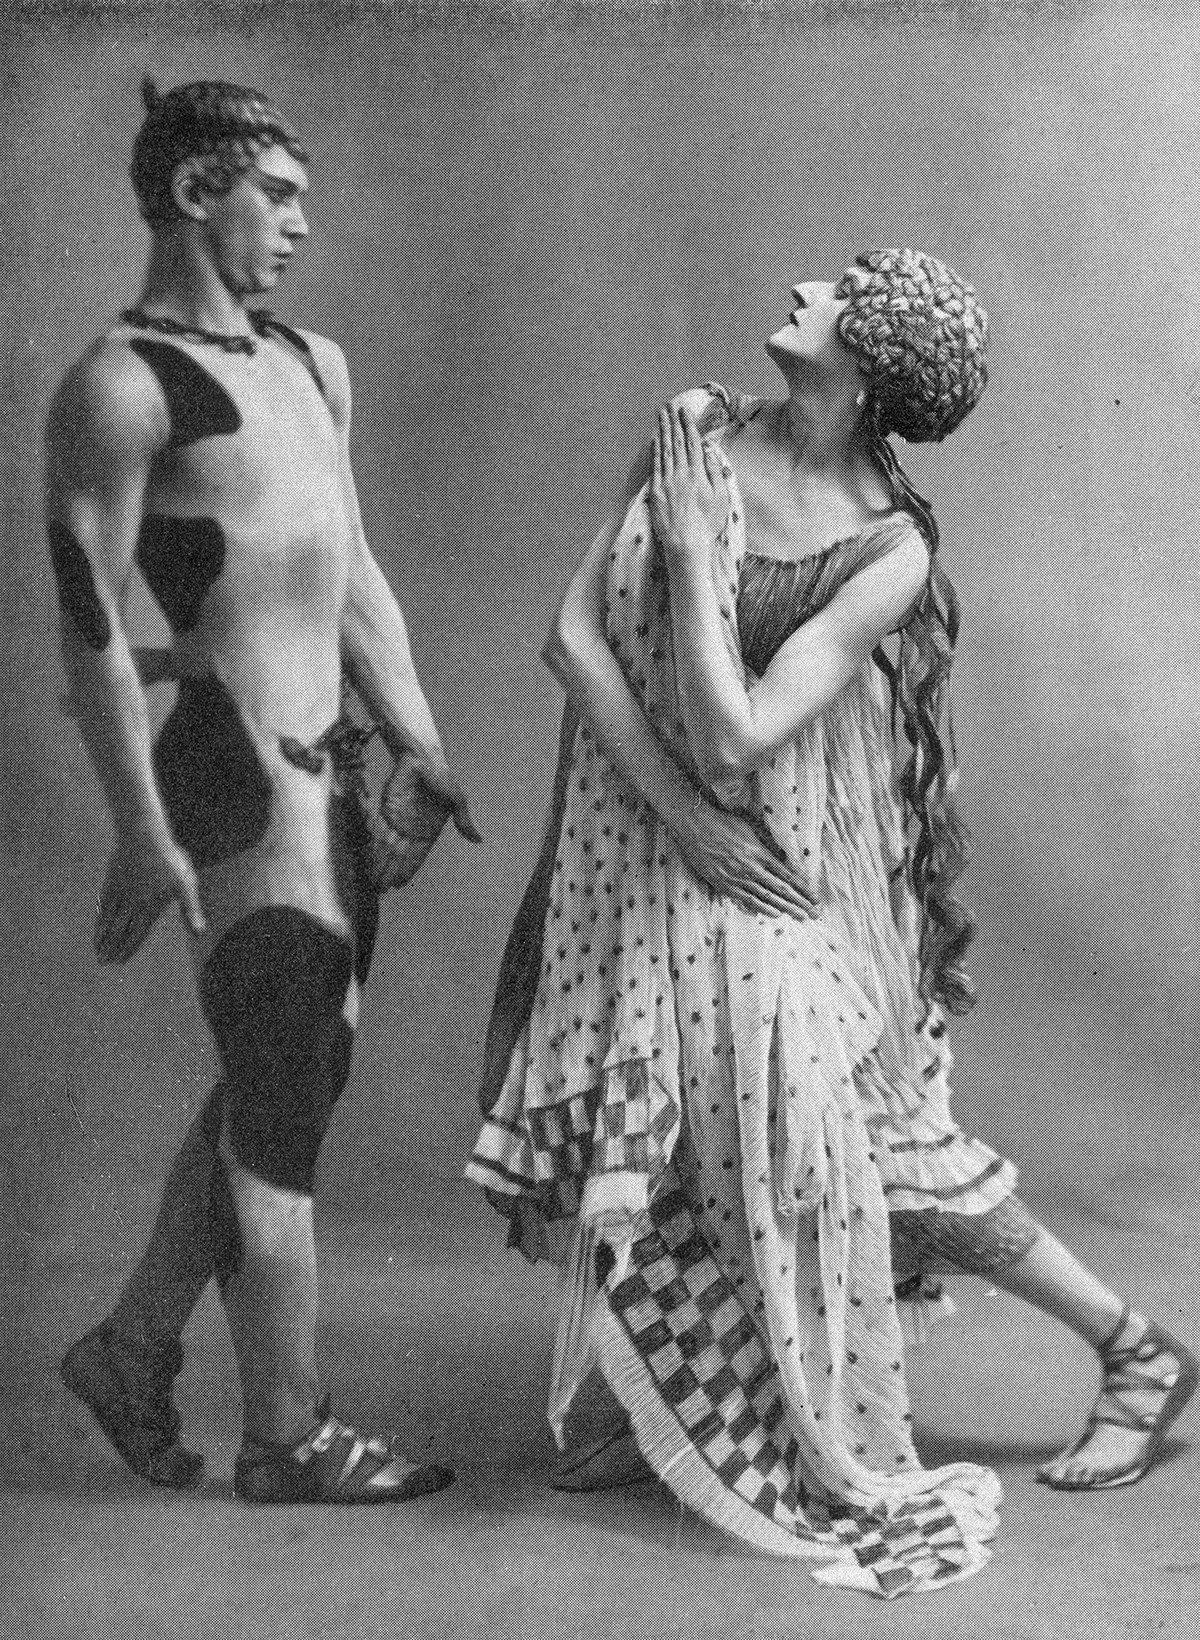 Nijinski e Partner, maio de 1912